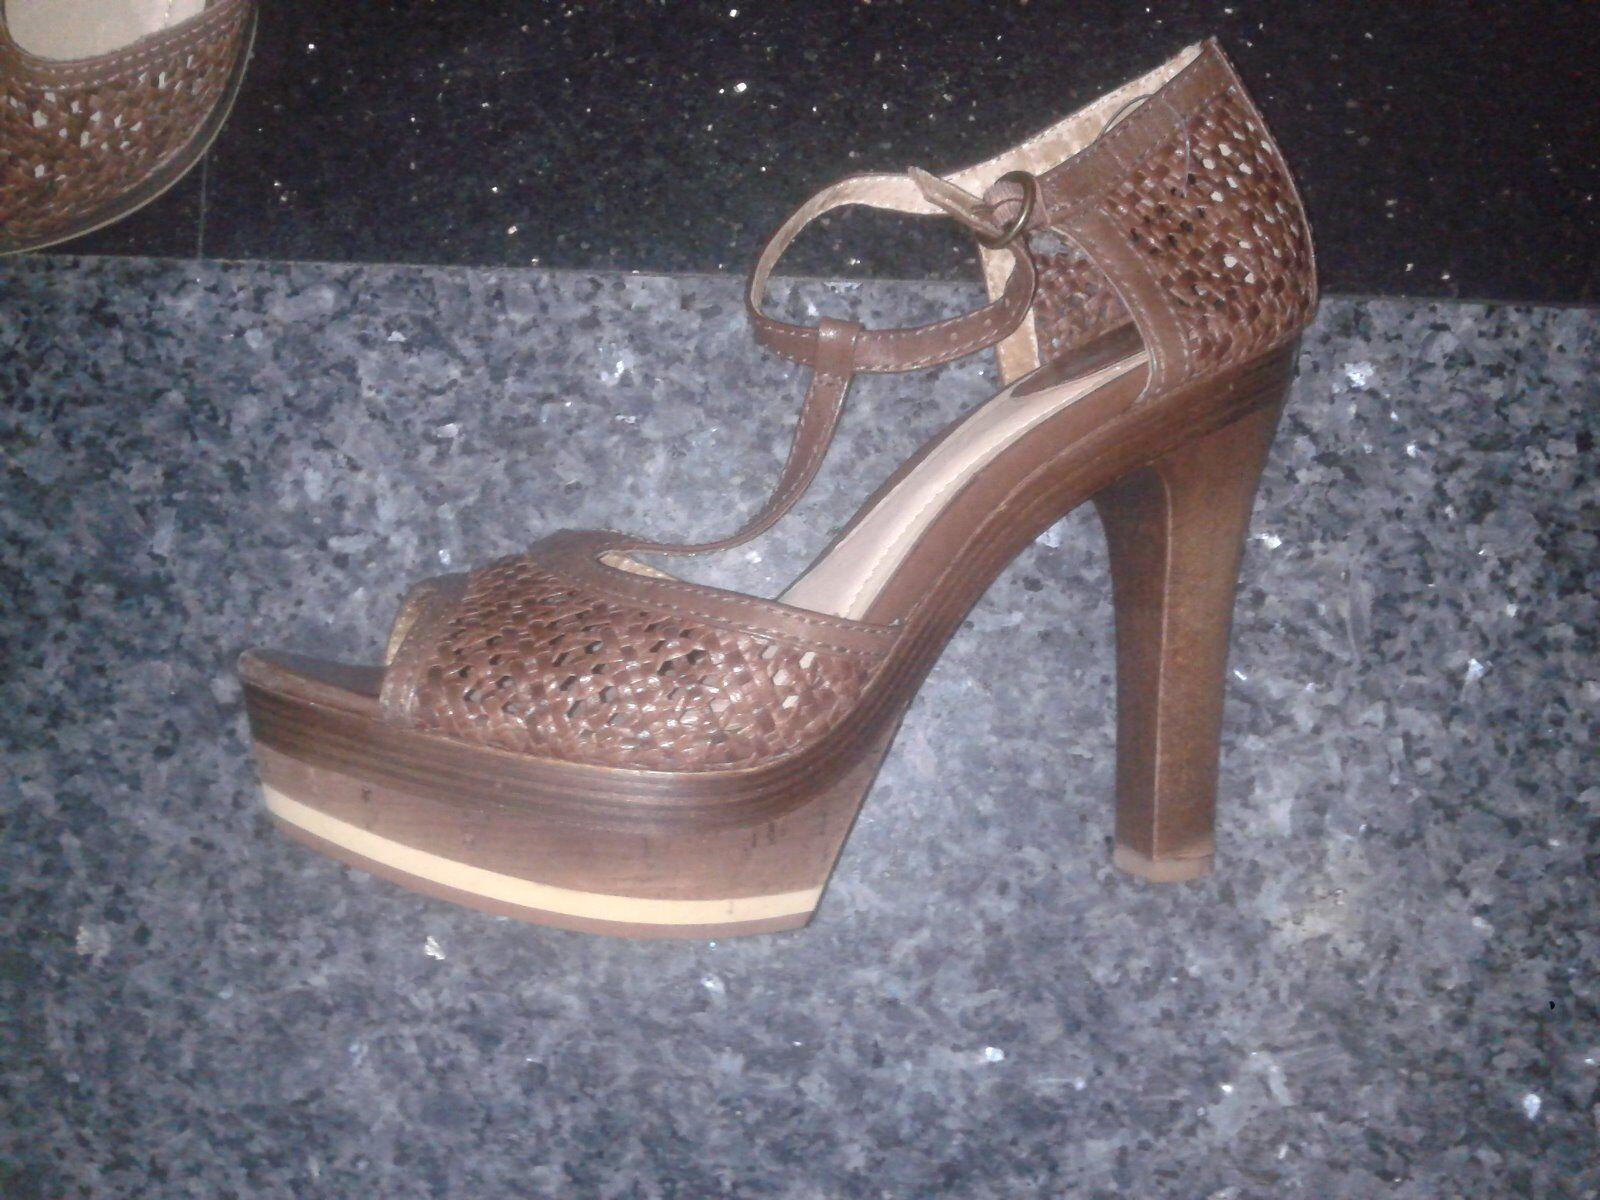 Alexander Wang Black Gemma Cutout Leather Mules Sandals. Size 38.5